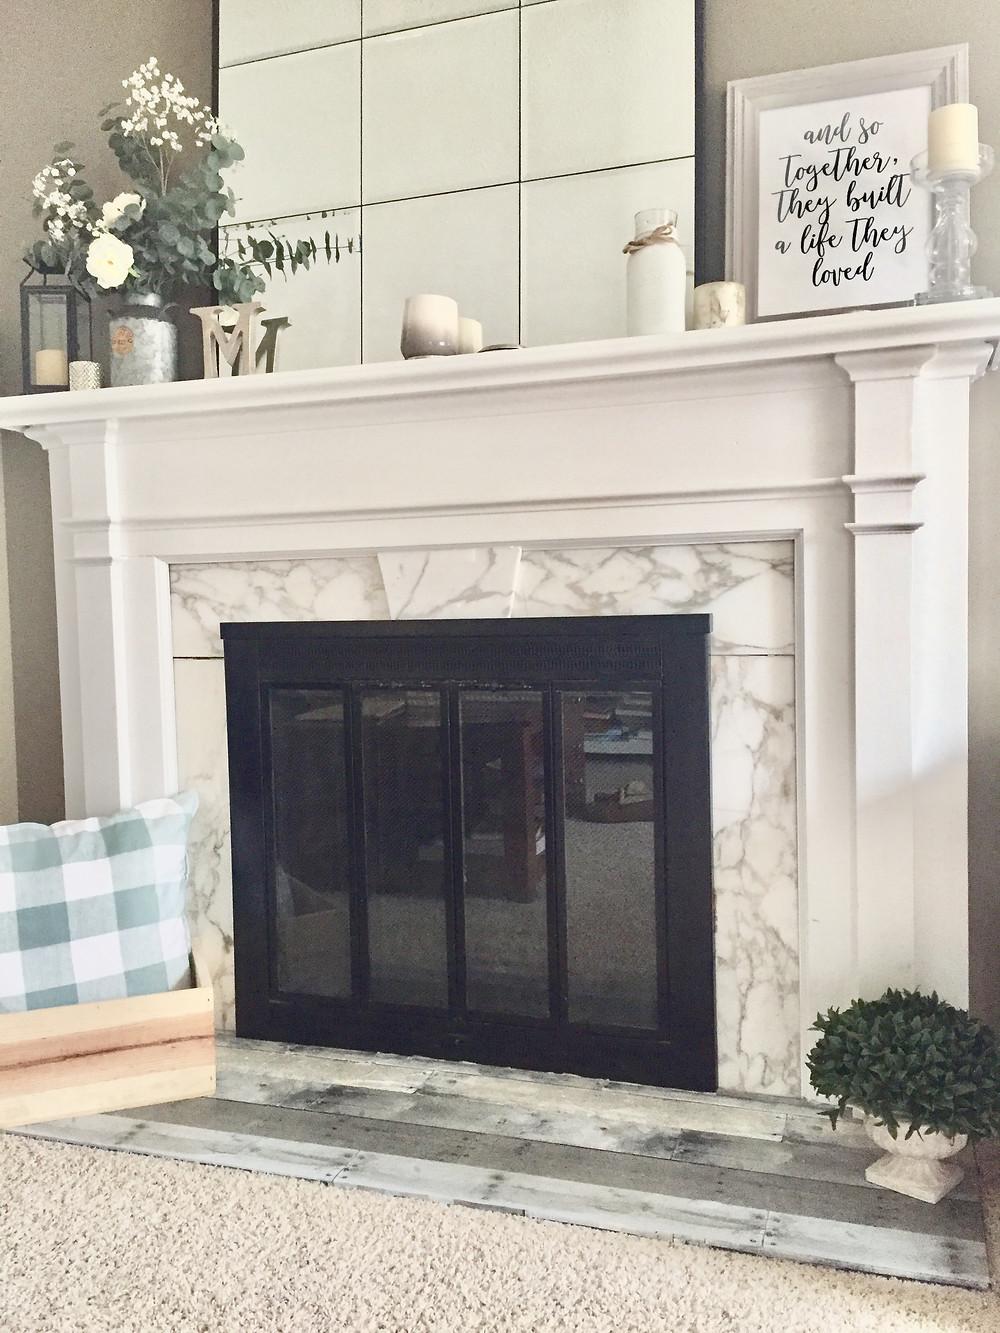 Reclaimed wood simple DIY fireplace hearth redo